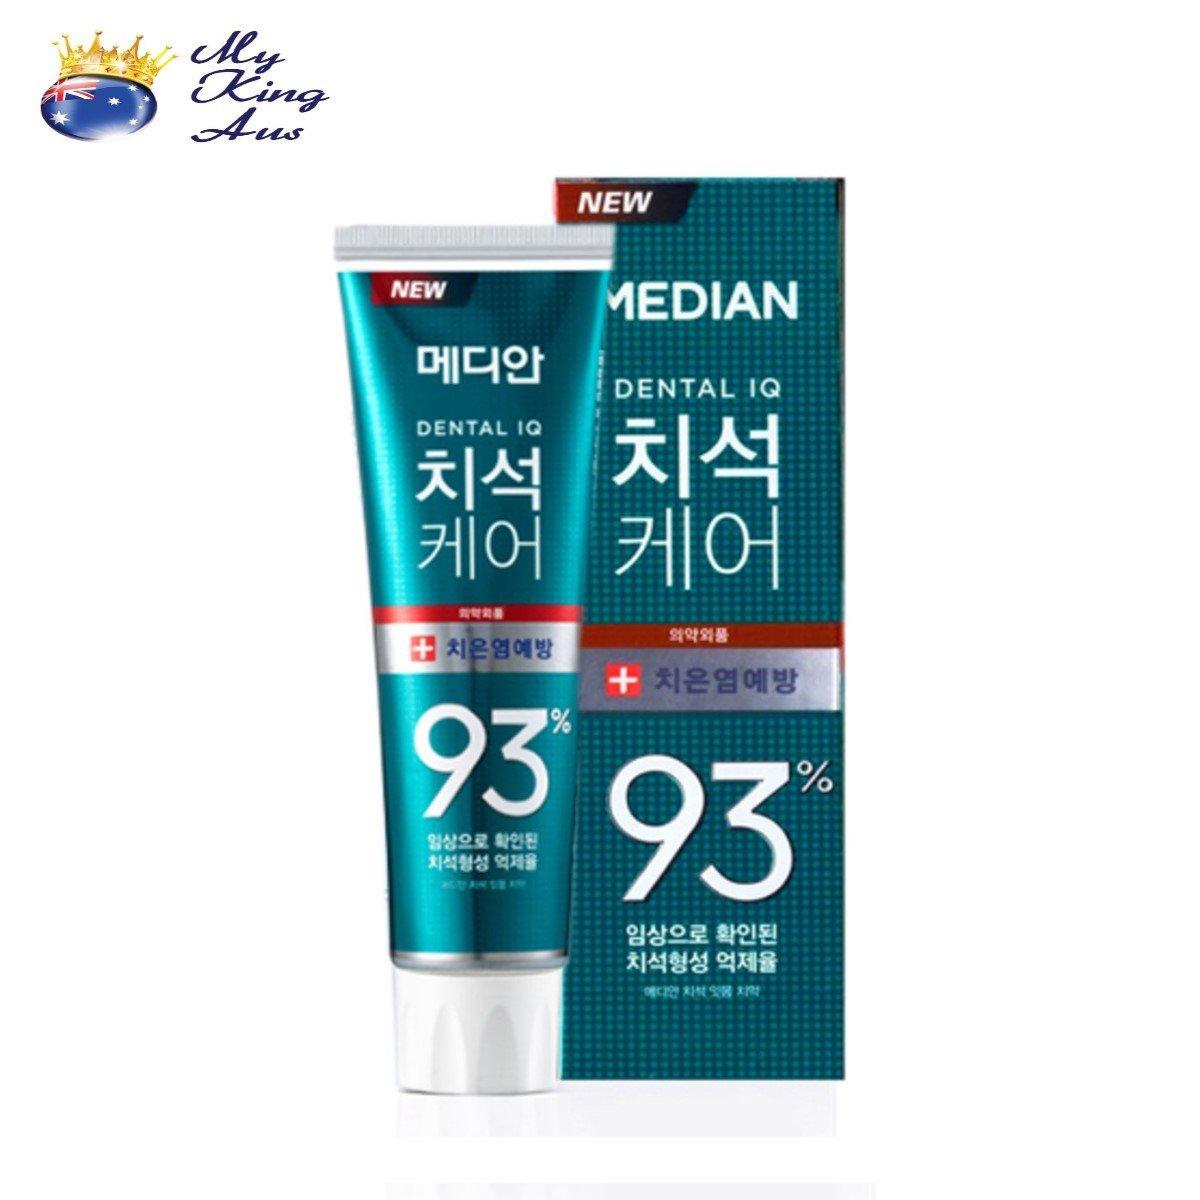 Dental IQ toothpaste 93% (Green) 120g